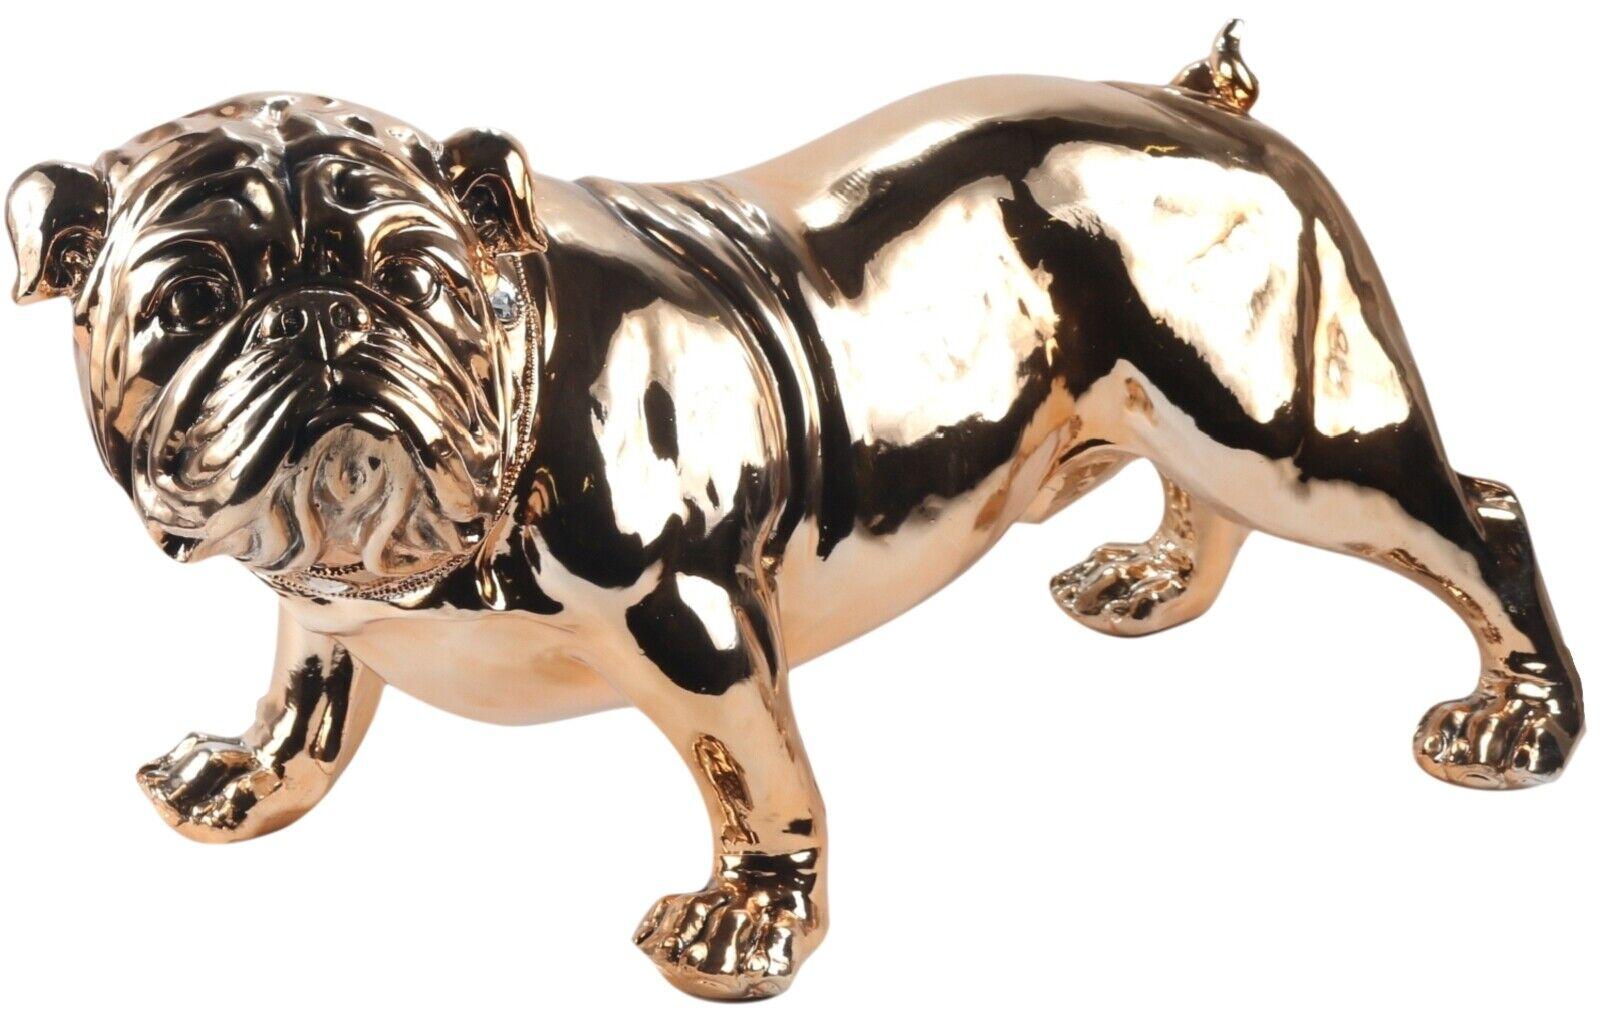 75cm Life Size British Bulldog Large Statue Electroplated Copper Polystone Ebay